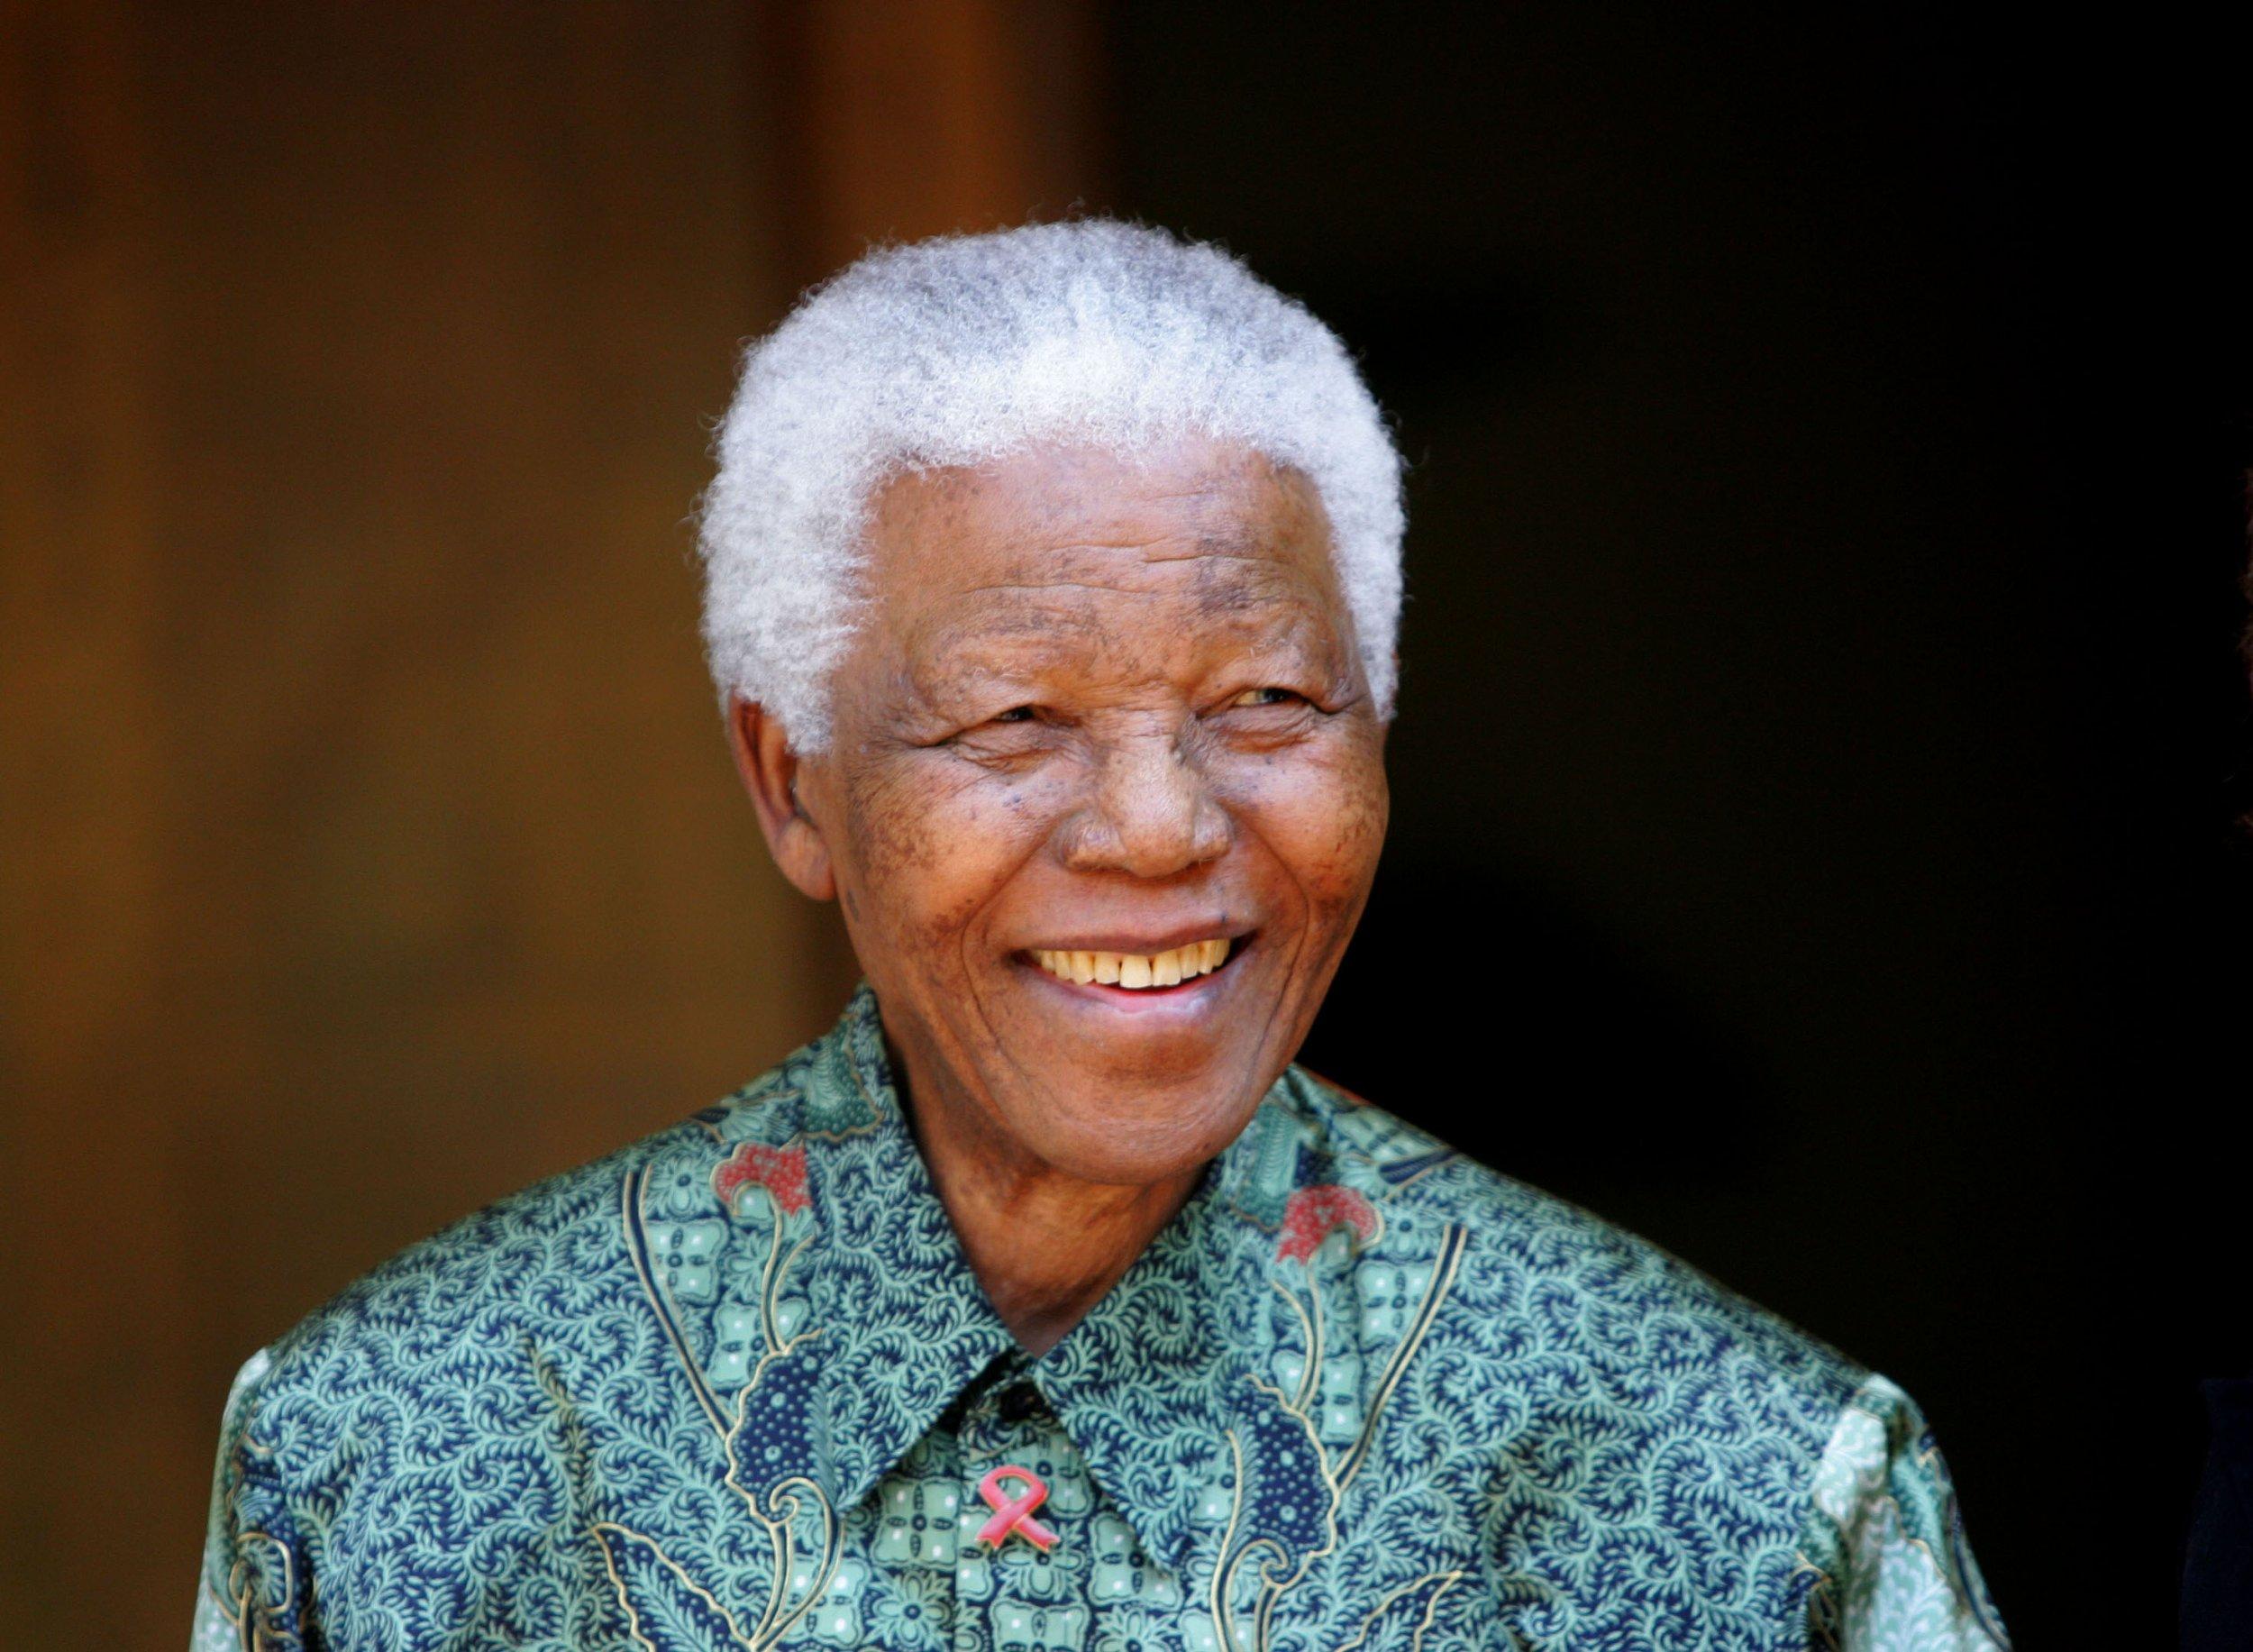 3-24-15 Mandela